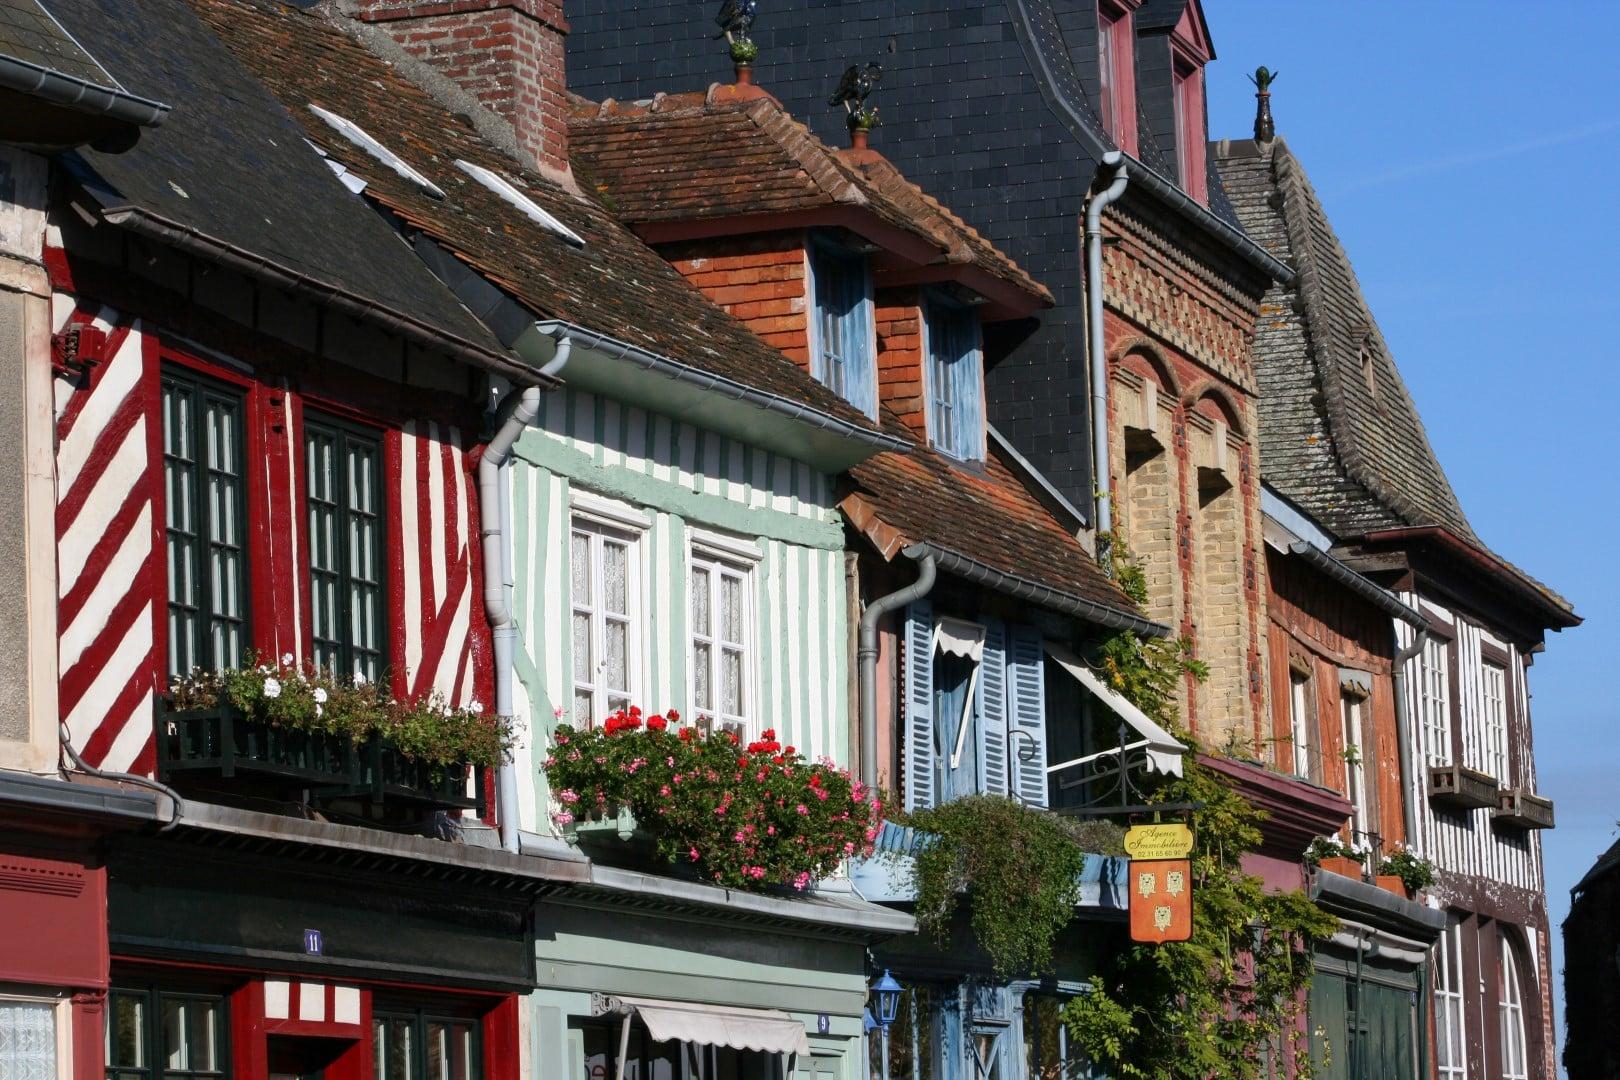 5-Beaumont-en-Auge-Loic_Durand___Calvados_Attractivite